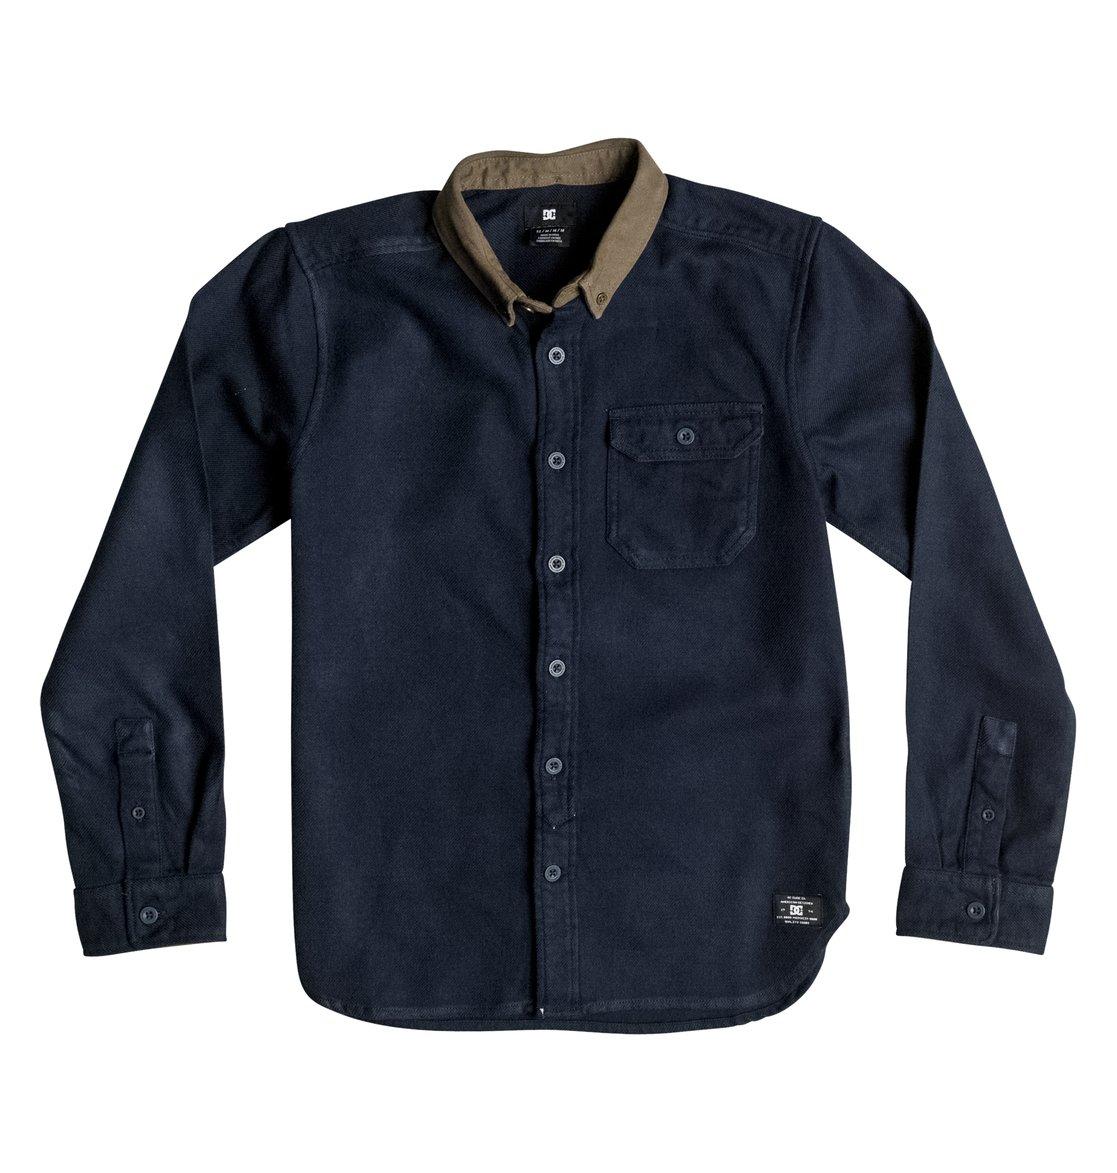 Рубашка Wallingstone Flannel с длинным рукавом